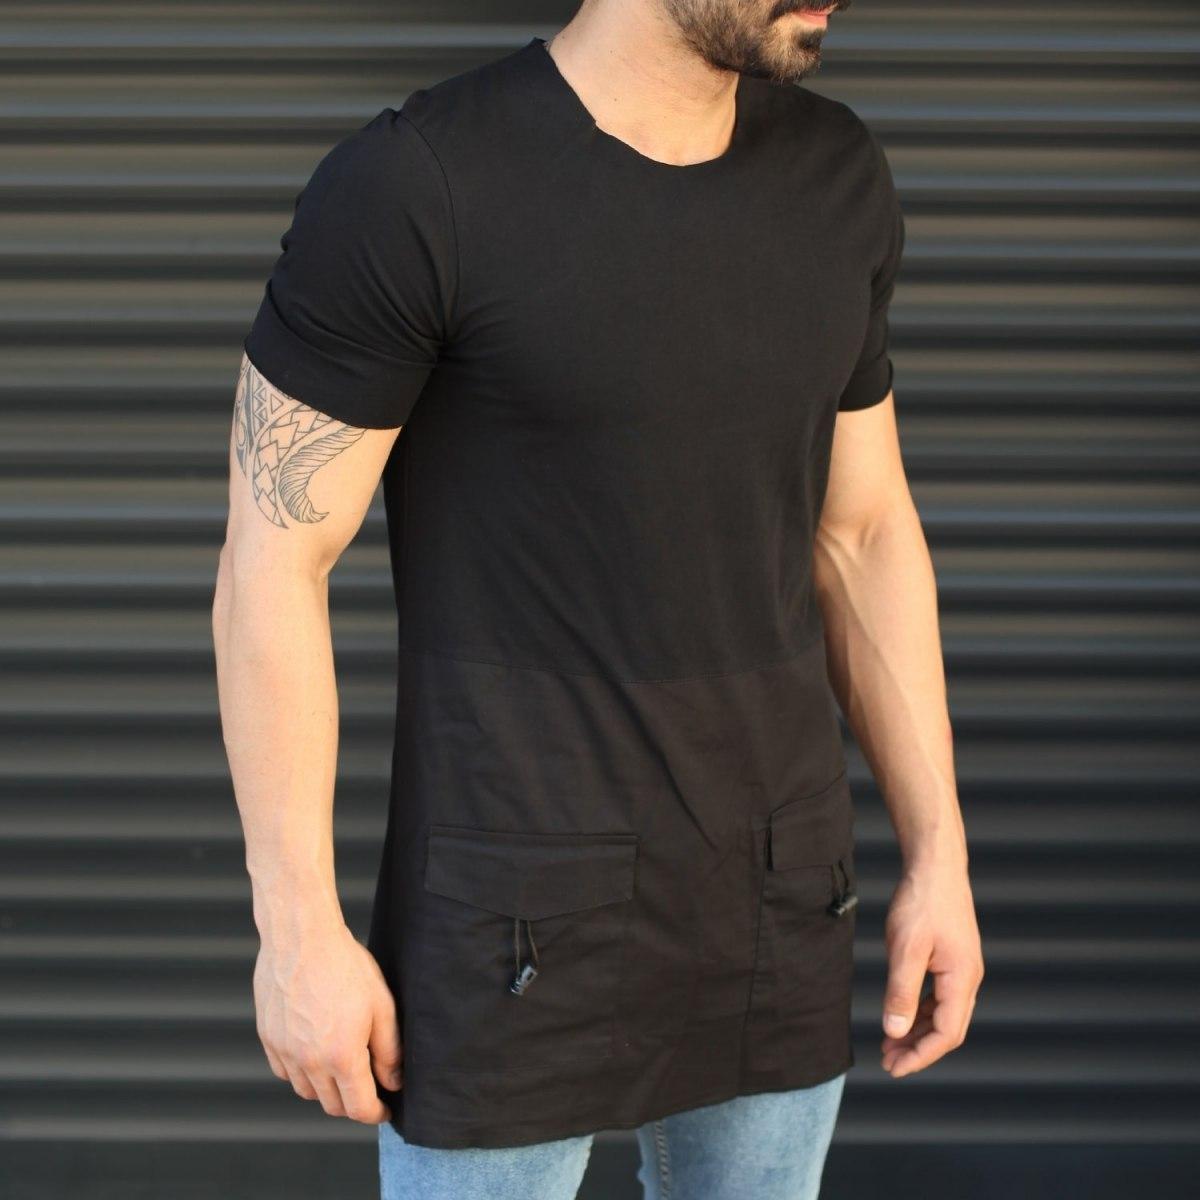 Men's Slim Fit Longline T-Shirt With Pockets Black Mv Premium Brand - 1